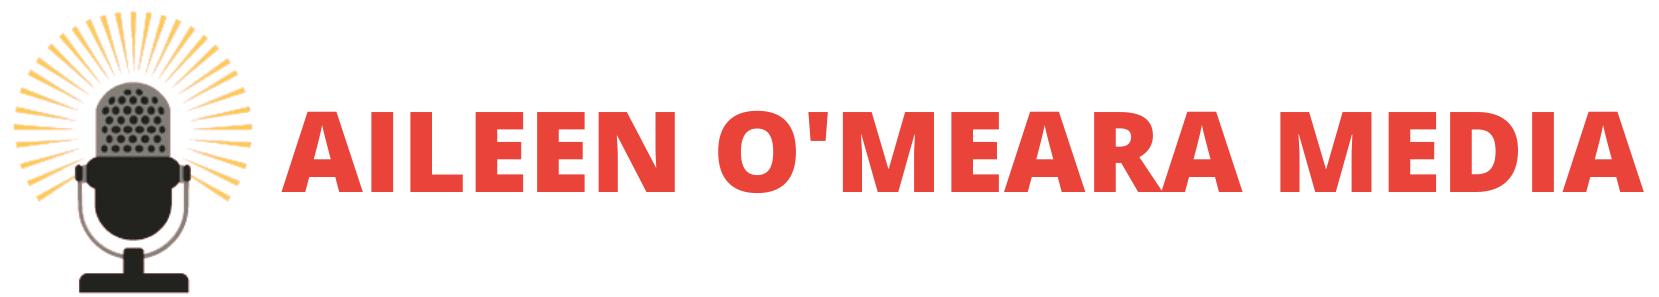 Aileen O'Meara Media